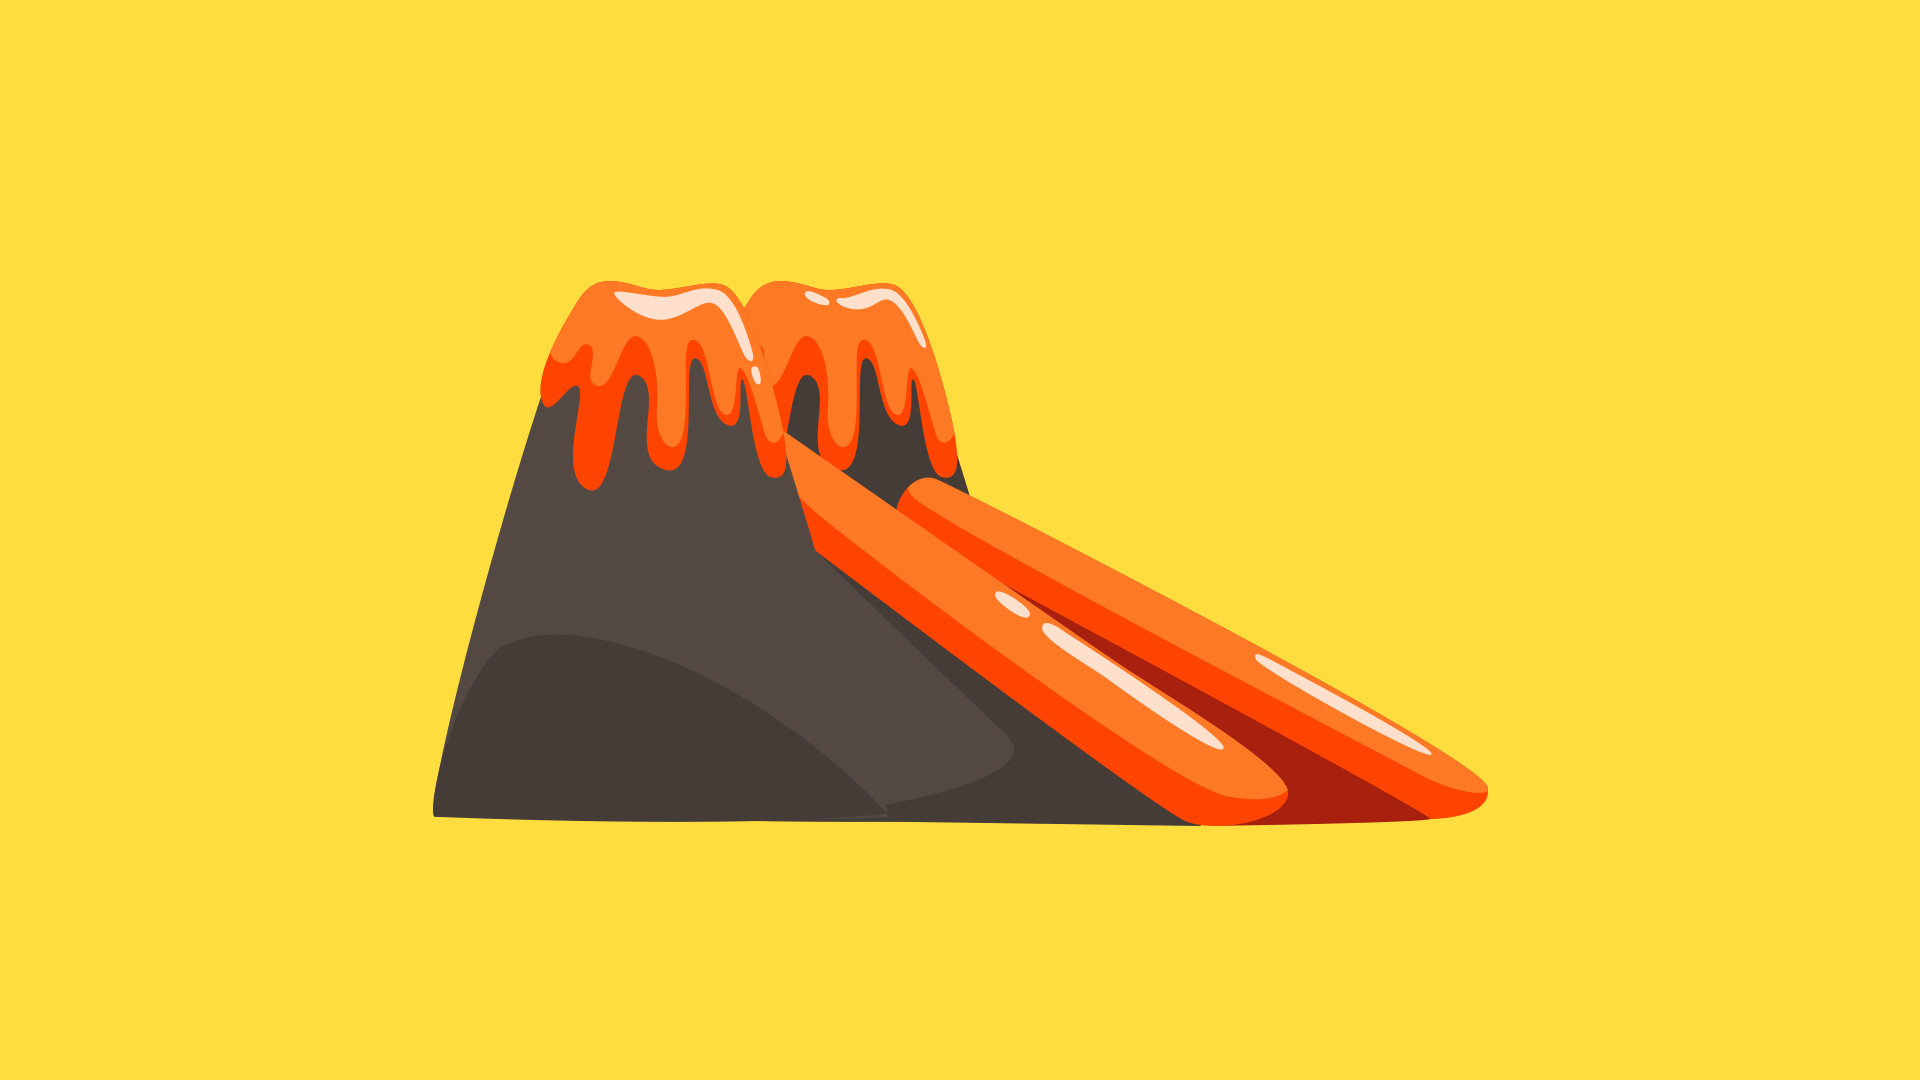 Volcano Bounce House